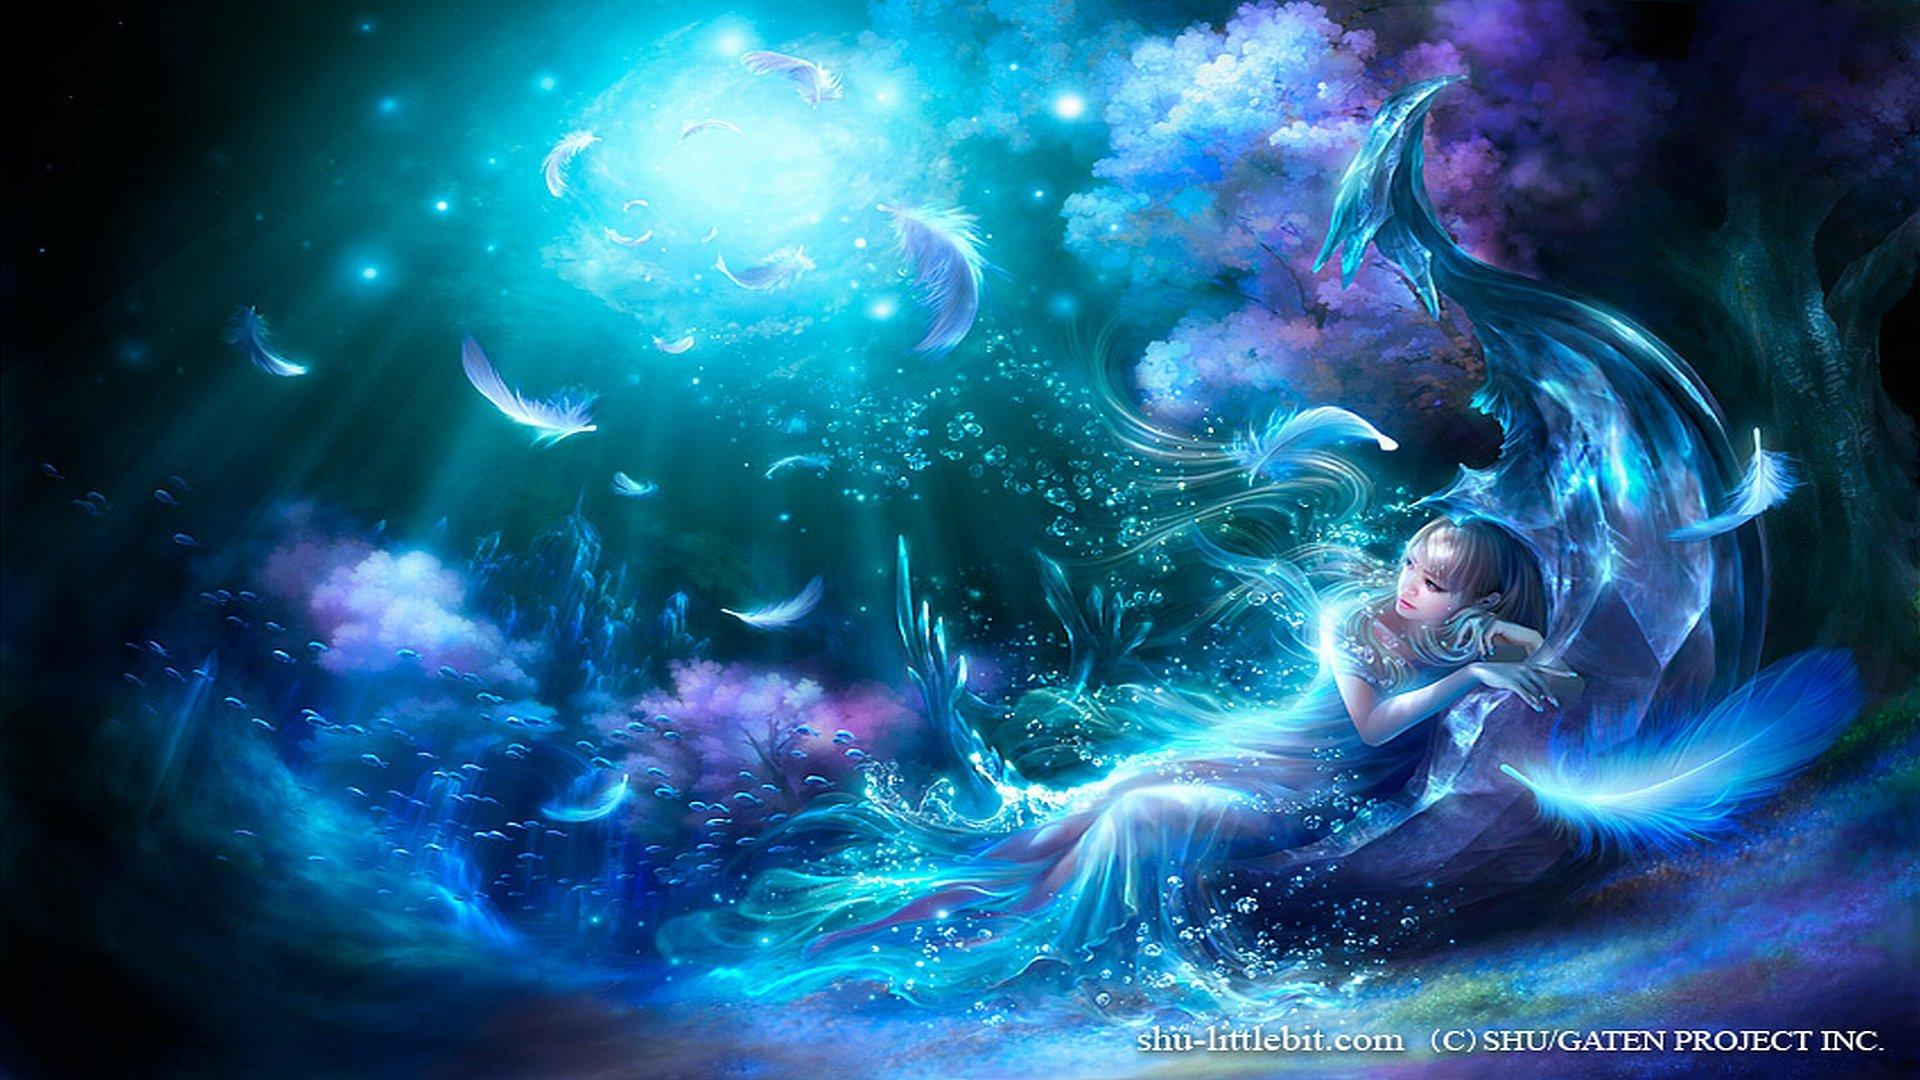 Download Fantasy Celestial Wallpaper 1920x1080 Full HD Wallpapers 1920x1080